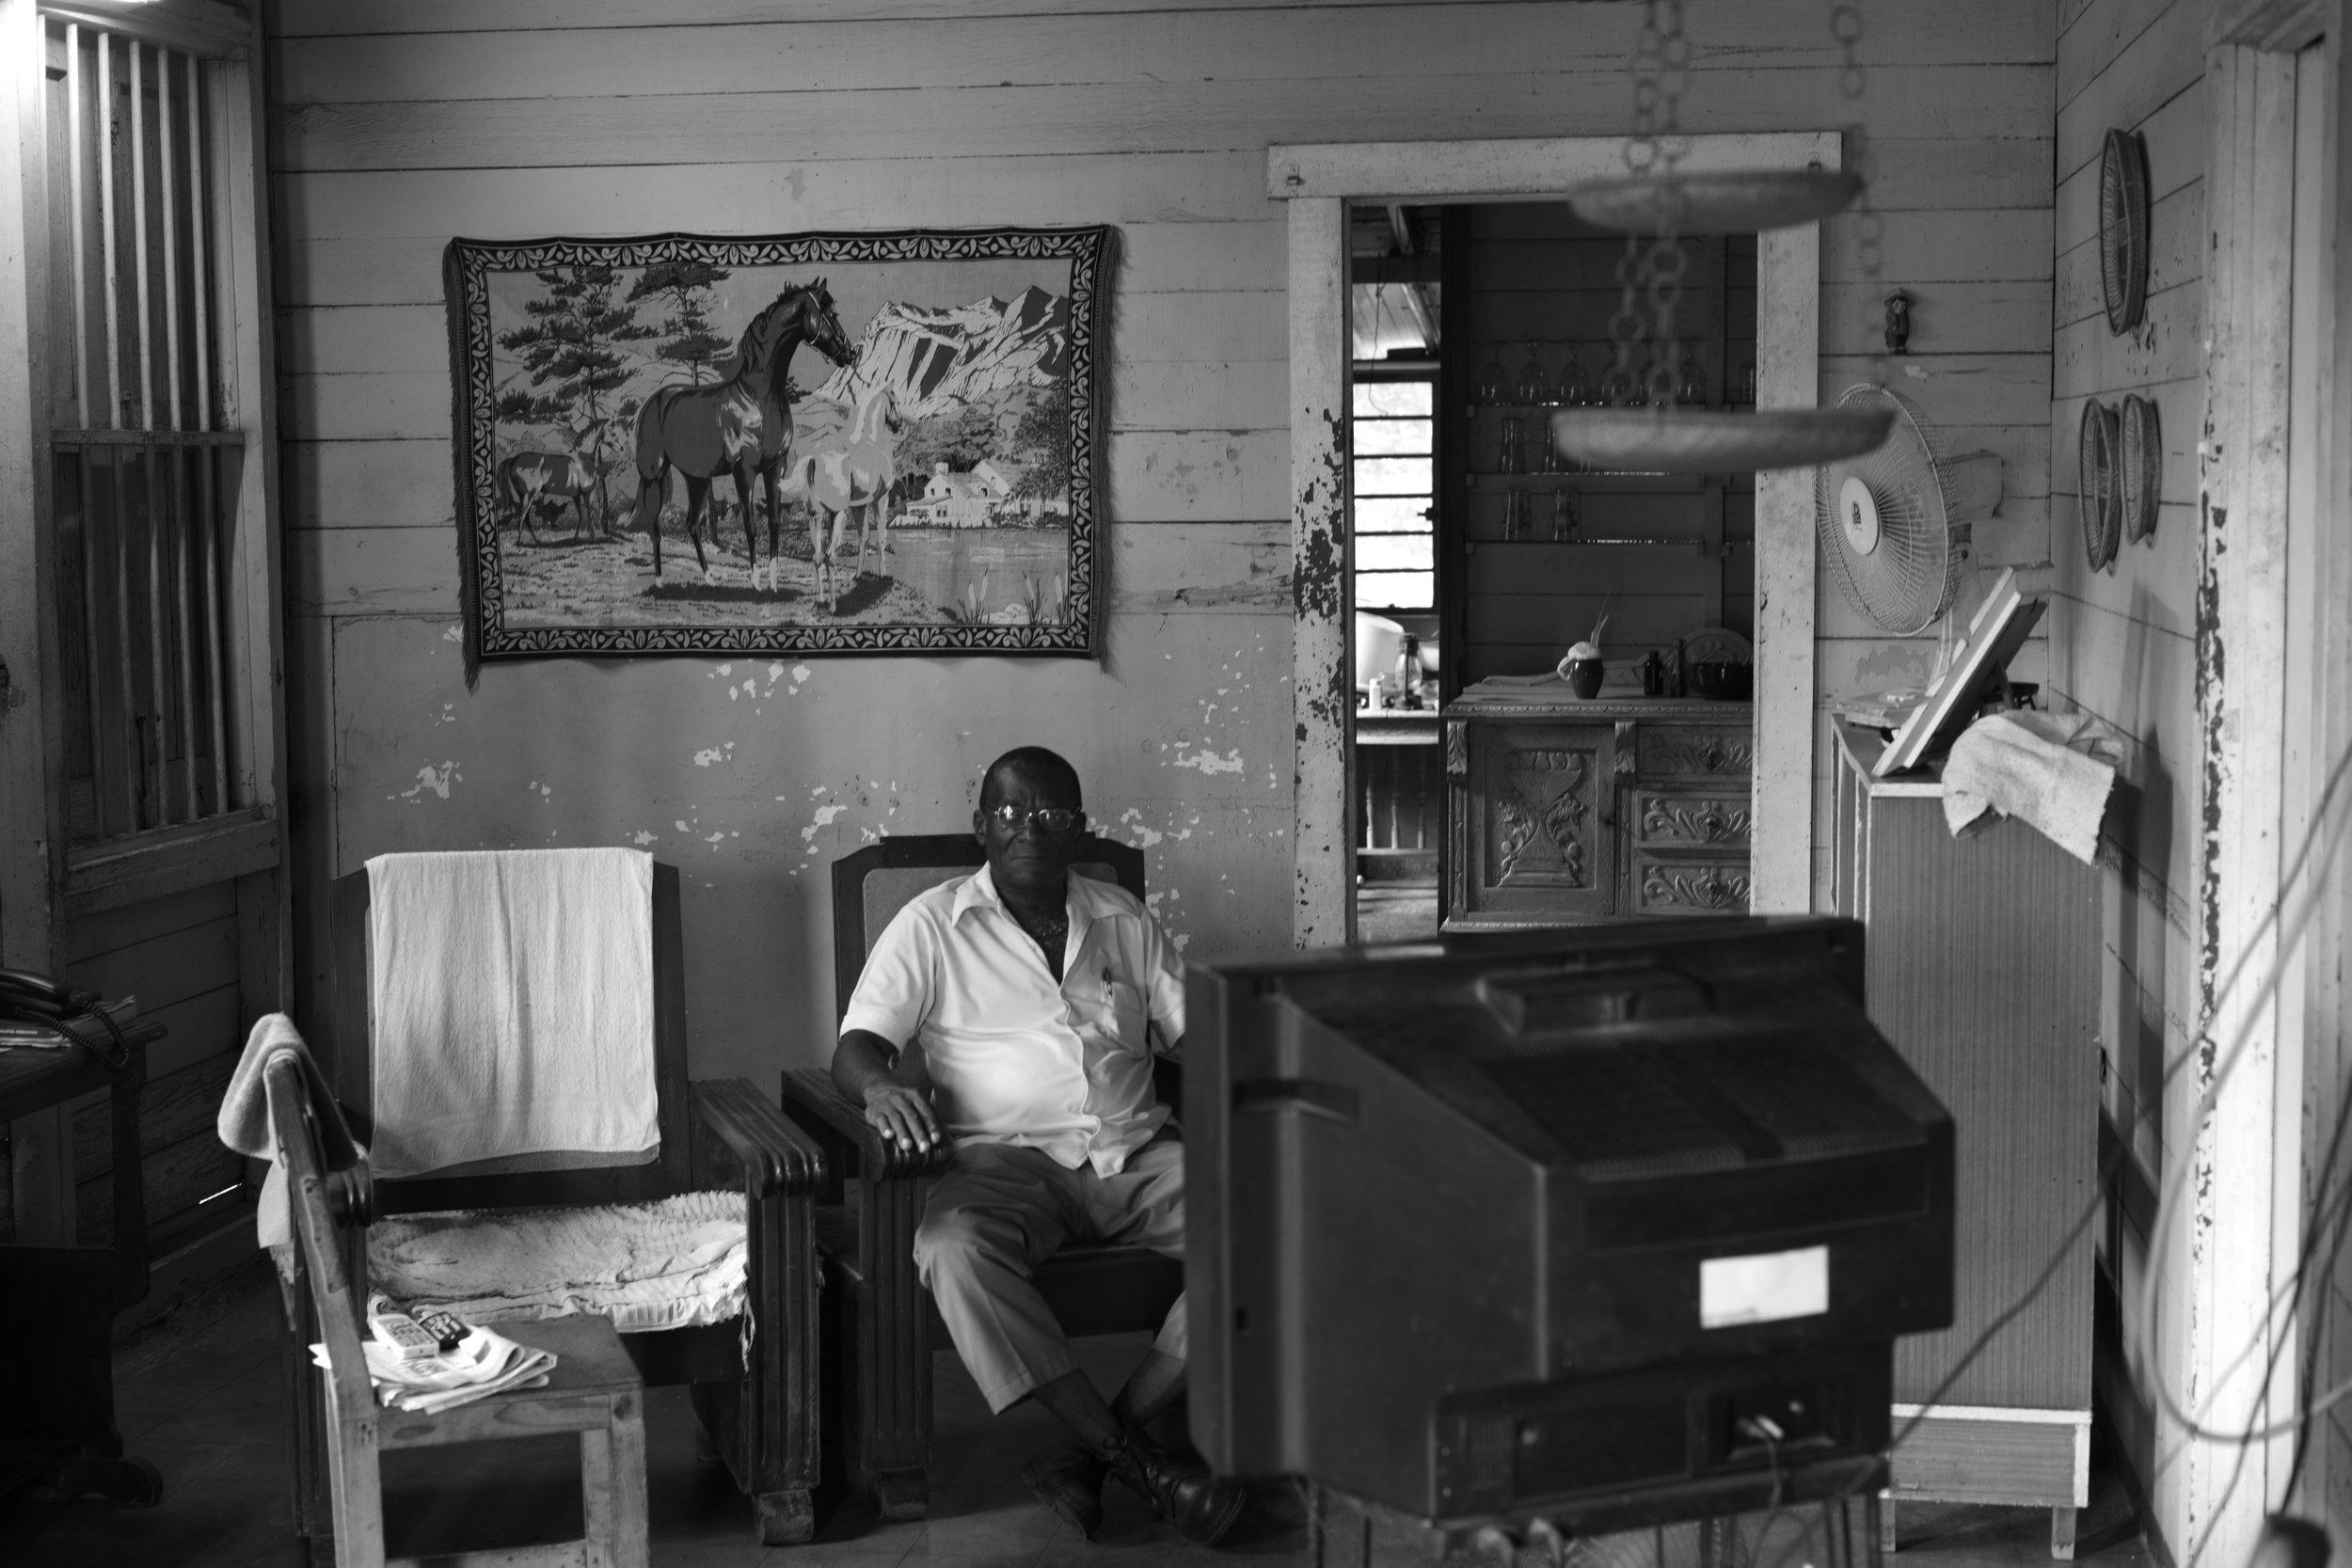 Hershey, Cuba